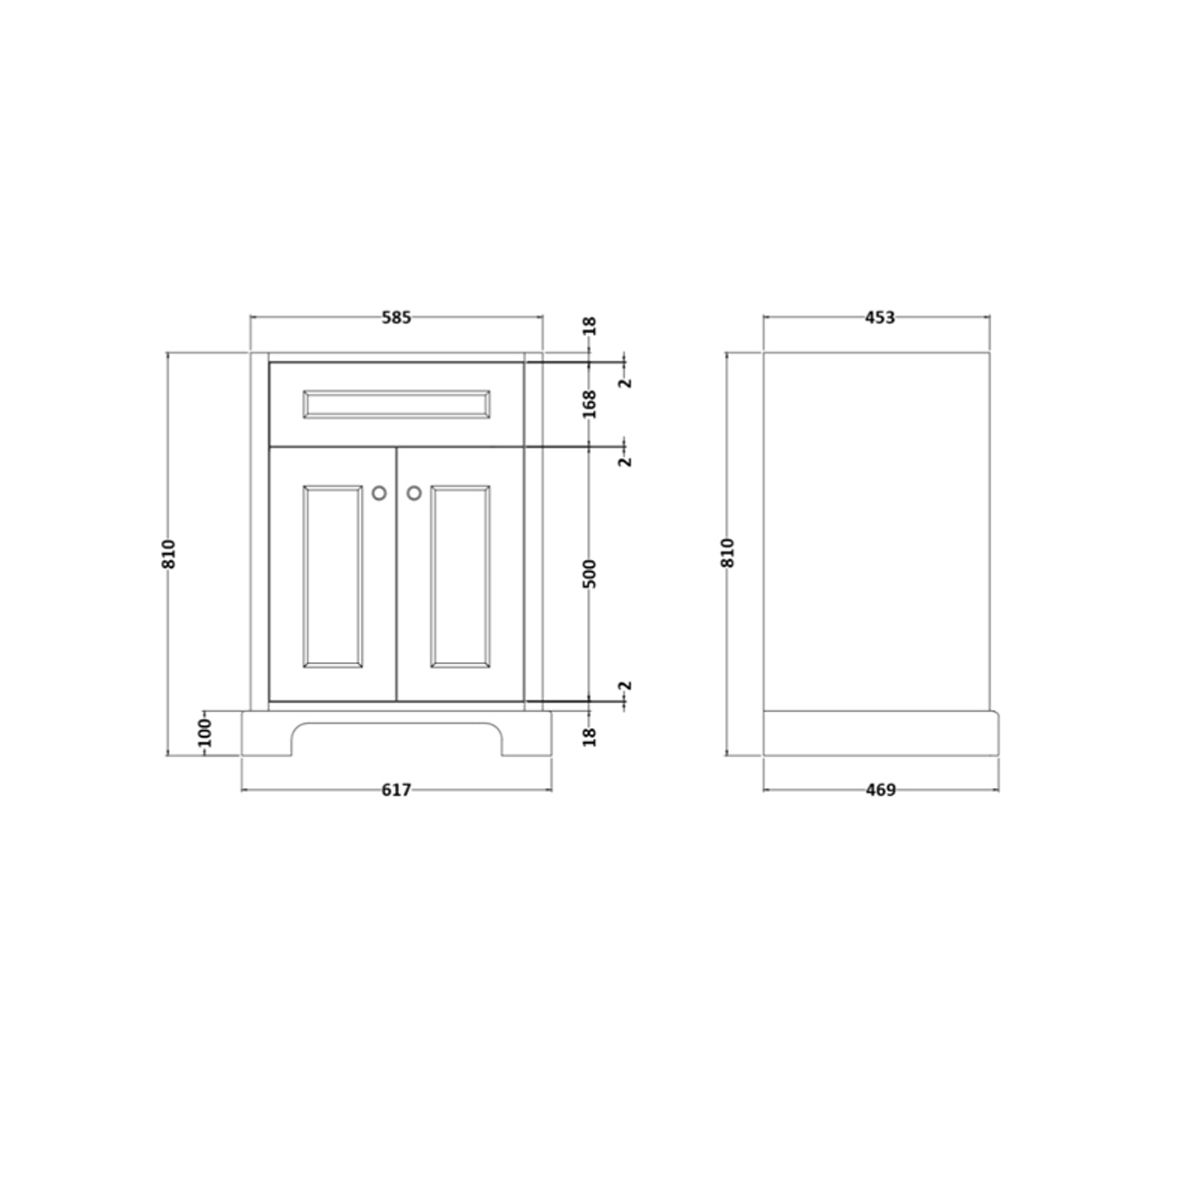 RAK Washington Cappucino Vanity Unit with Grey Countertop 600mm Measurements